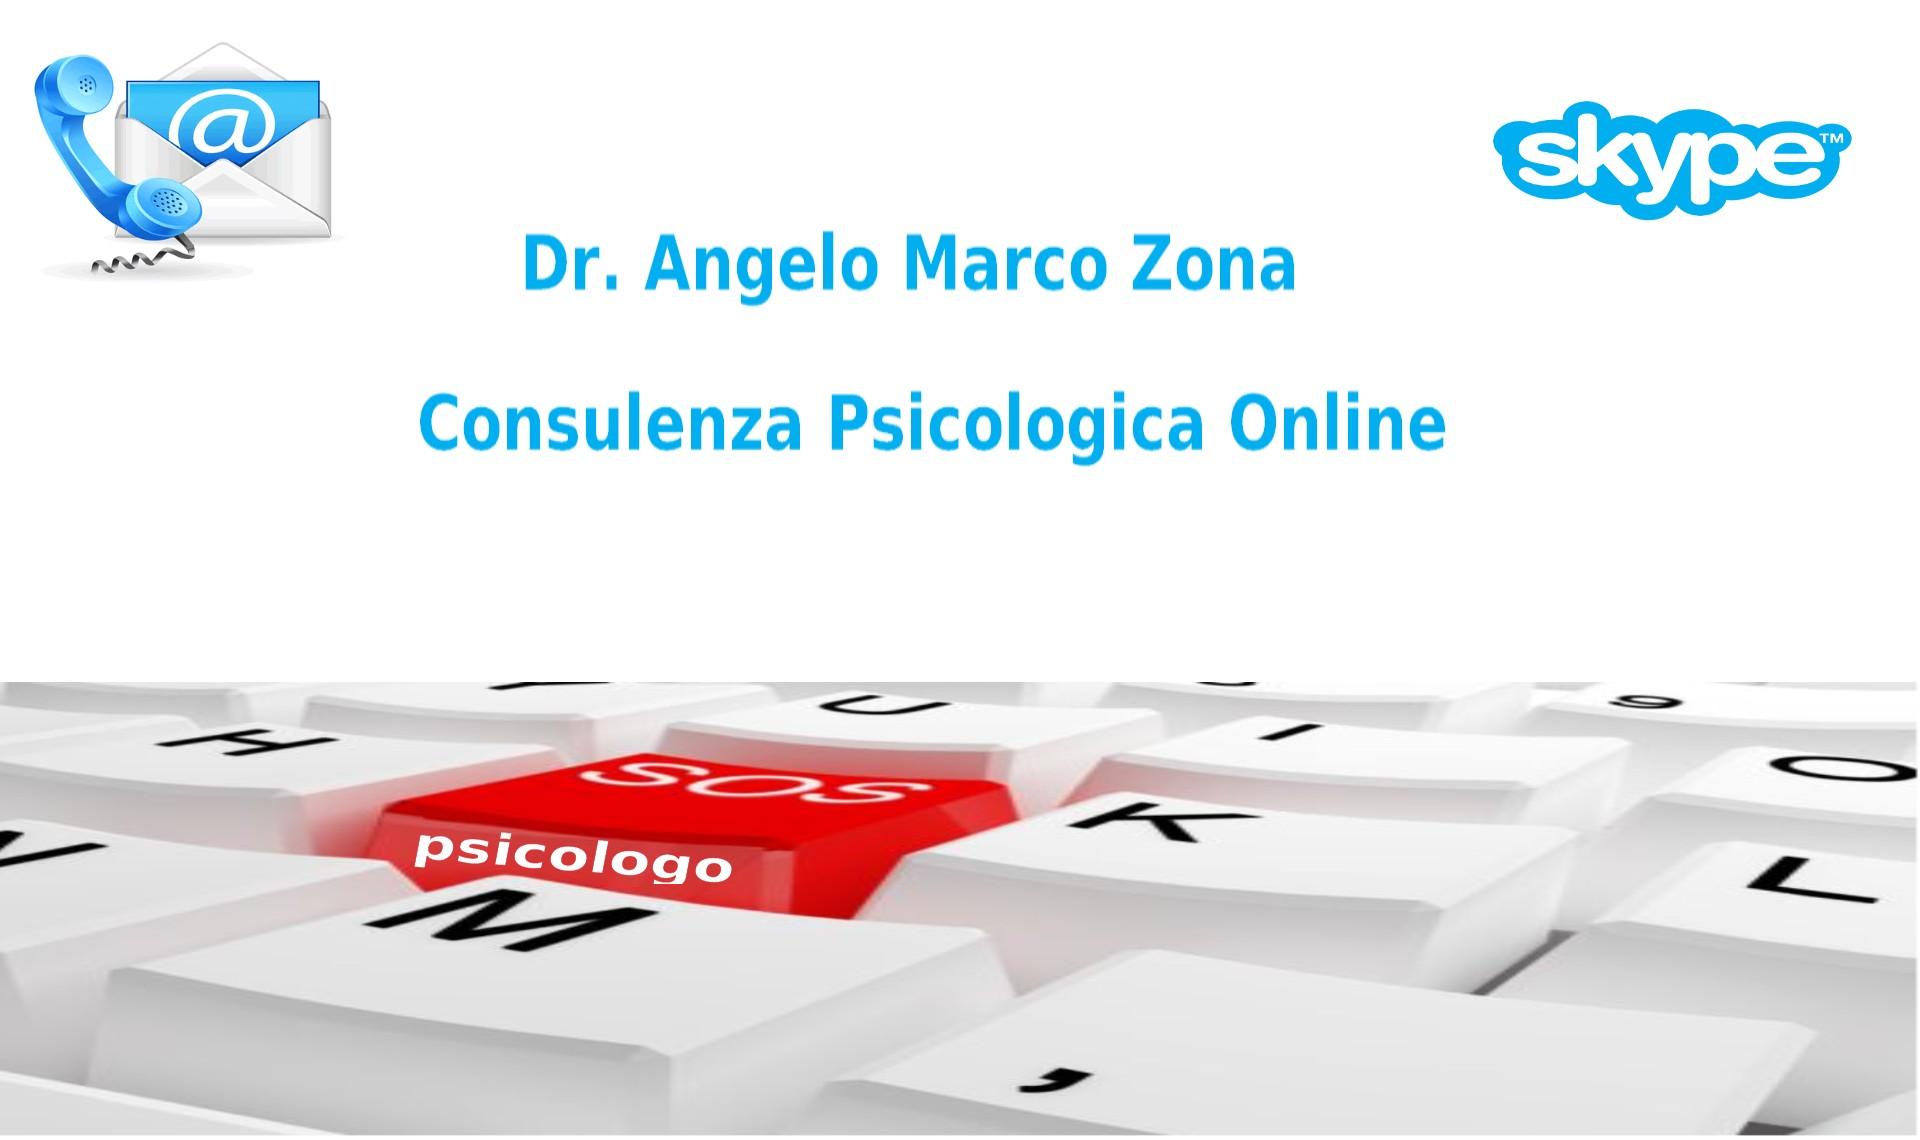 Consulenza Online Psicologo5